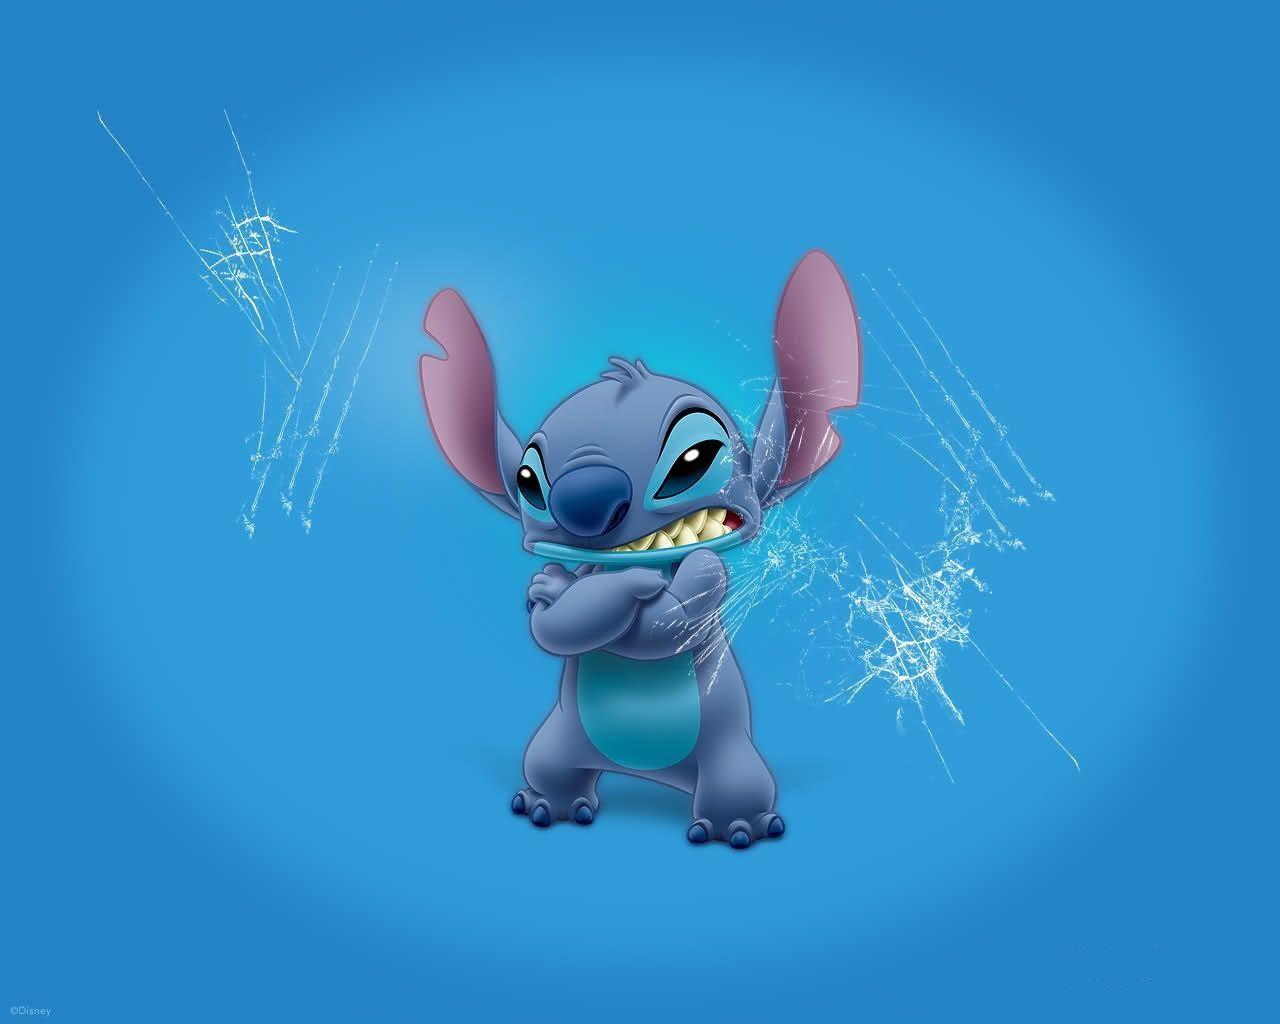 Pin By Chuli Snaki On Disney Stitch Lilo And Stitch Disney Phone Wallpaper Wallpaper Backgrounds